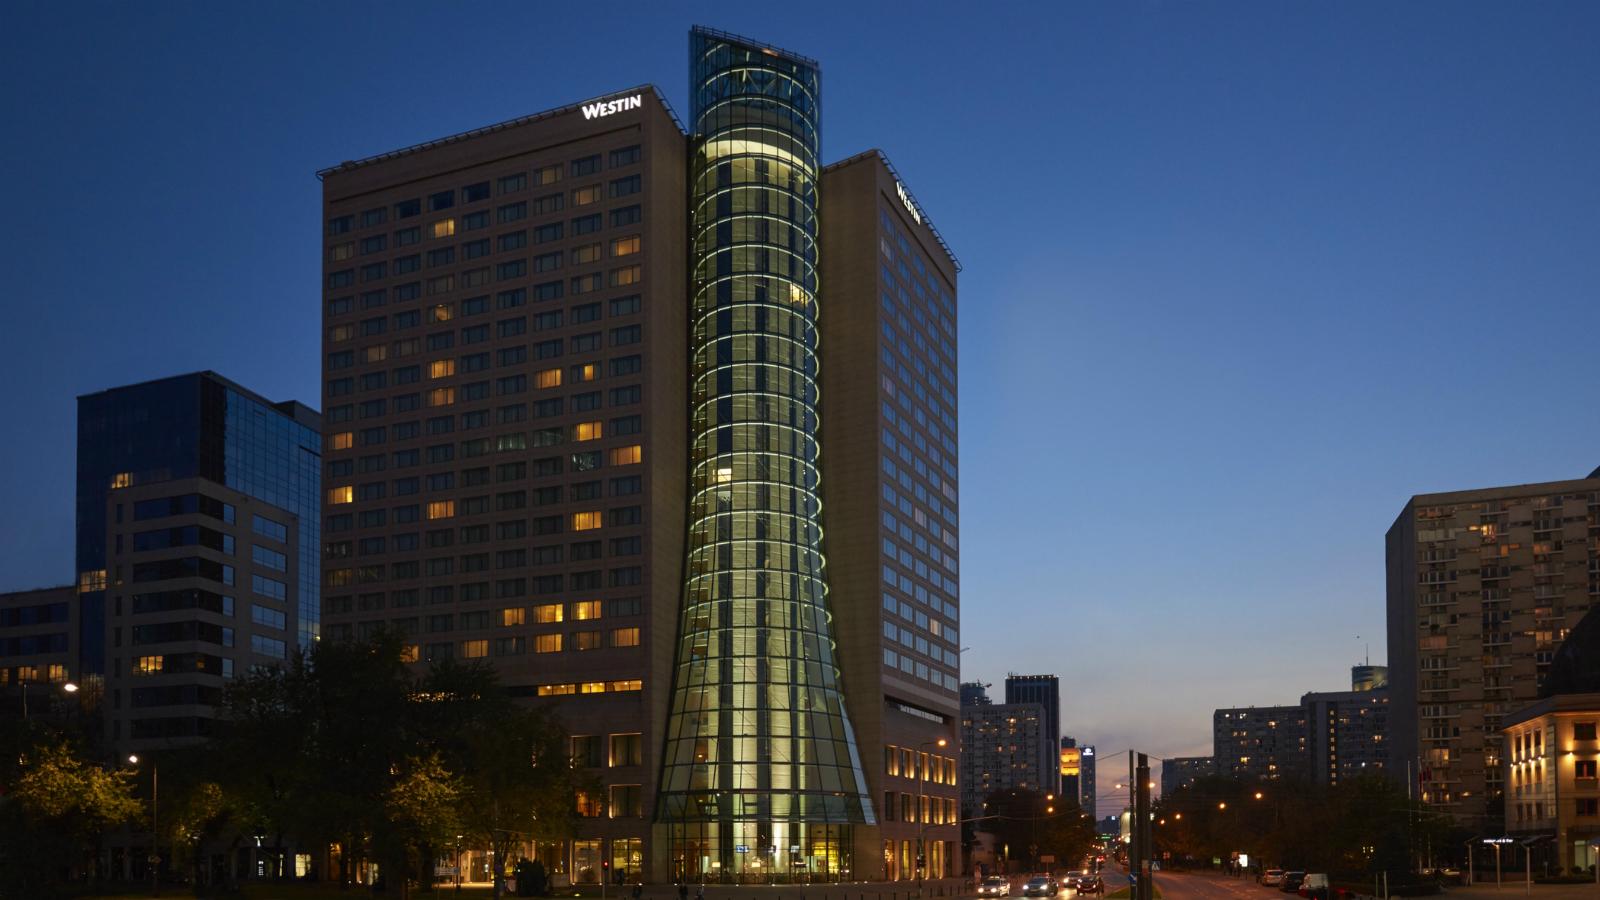 Westin-Warsaw-The-Facade-At-Night